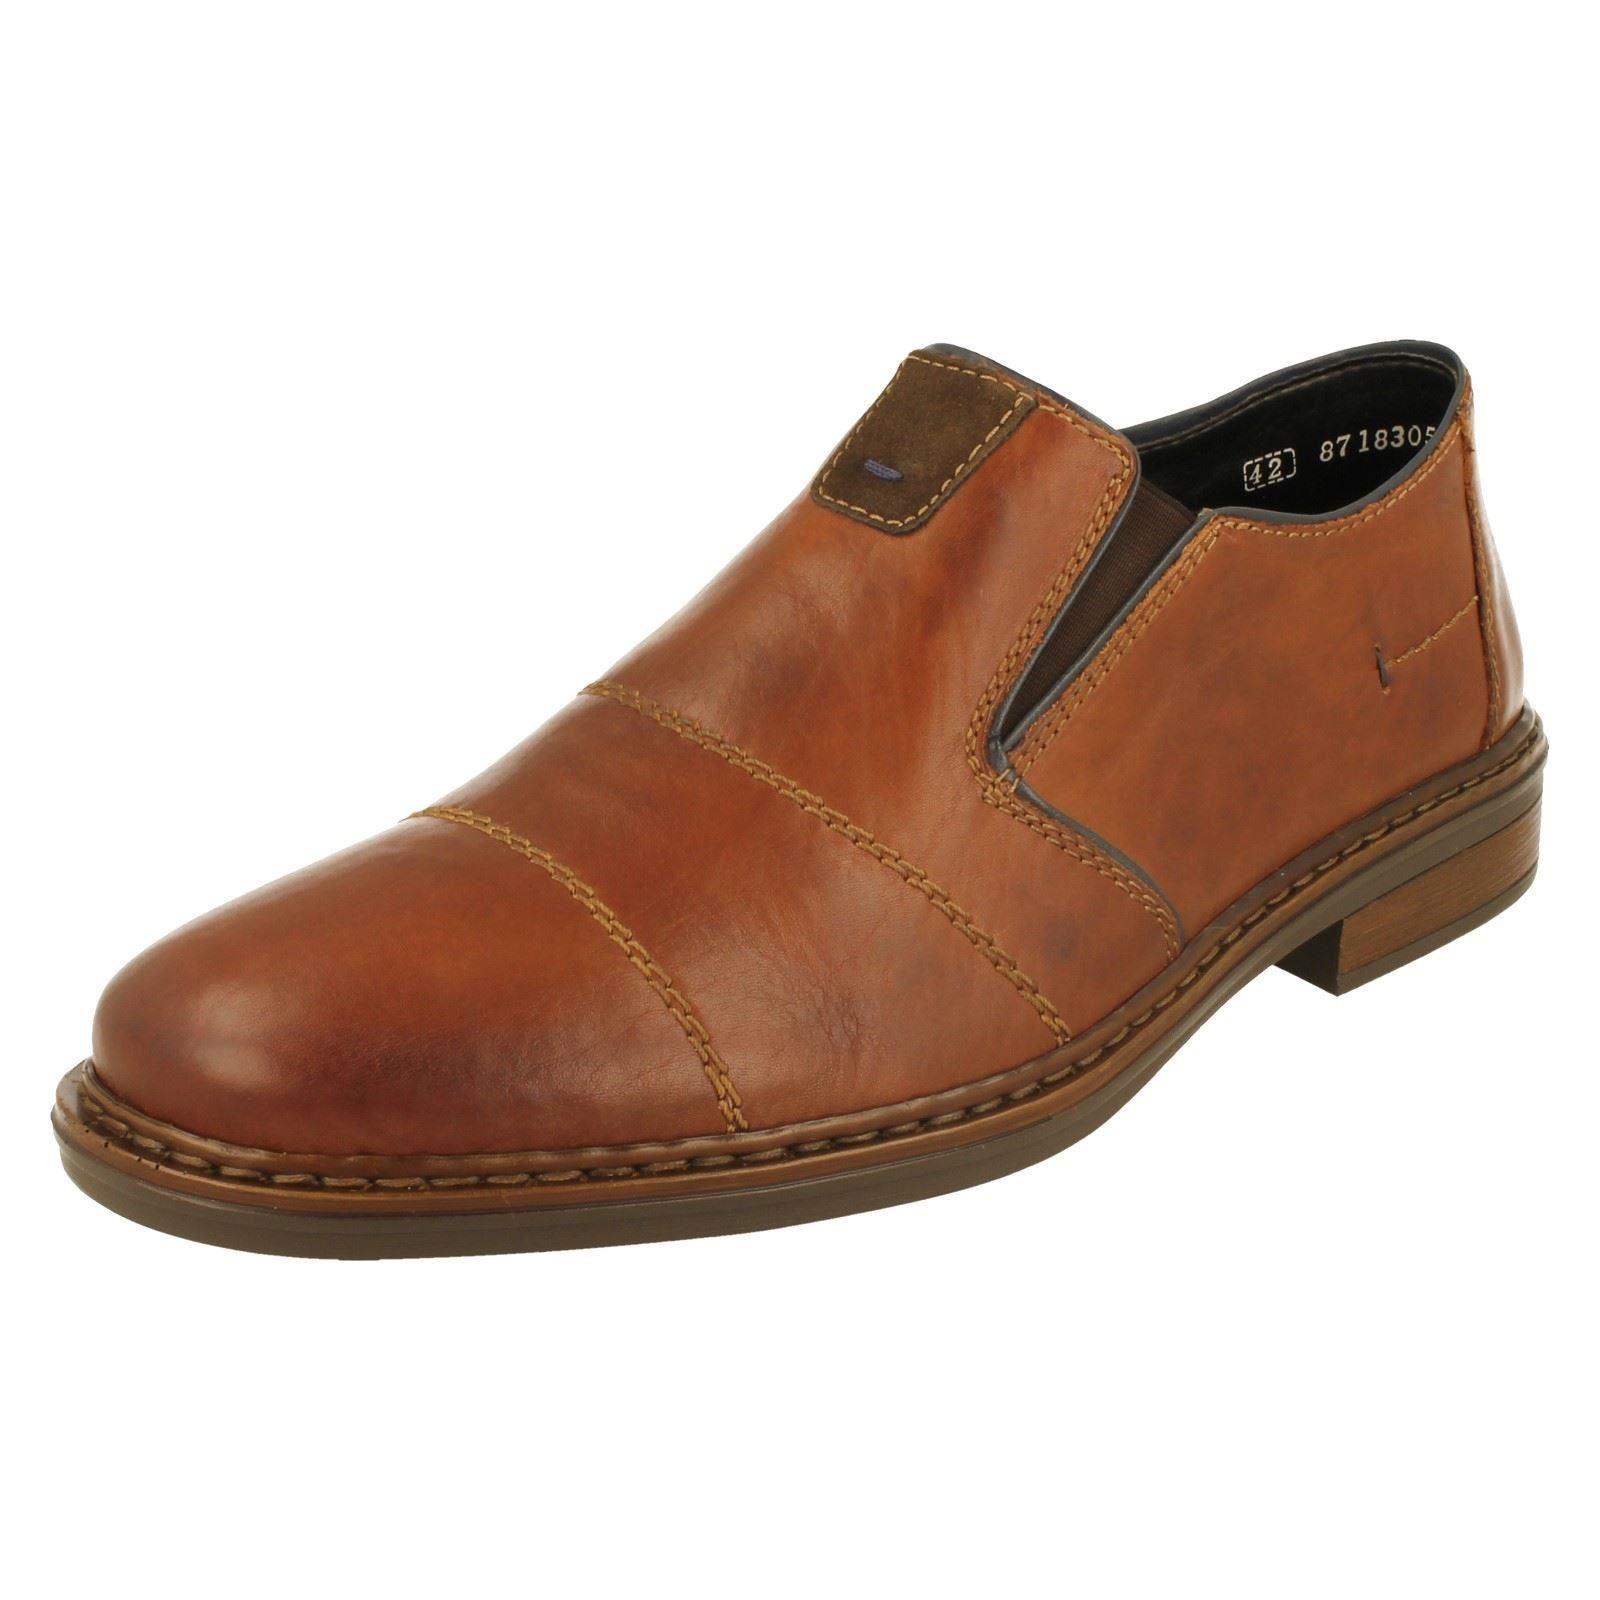 Rieker Mens Formal Shoes Shoes Formal - 17661 470cb5